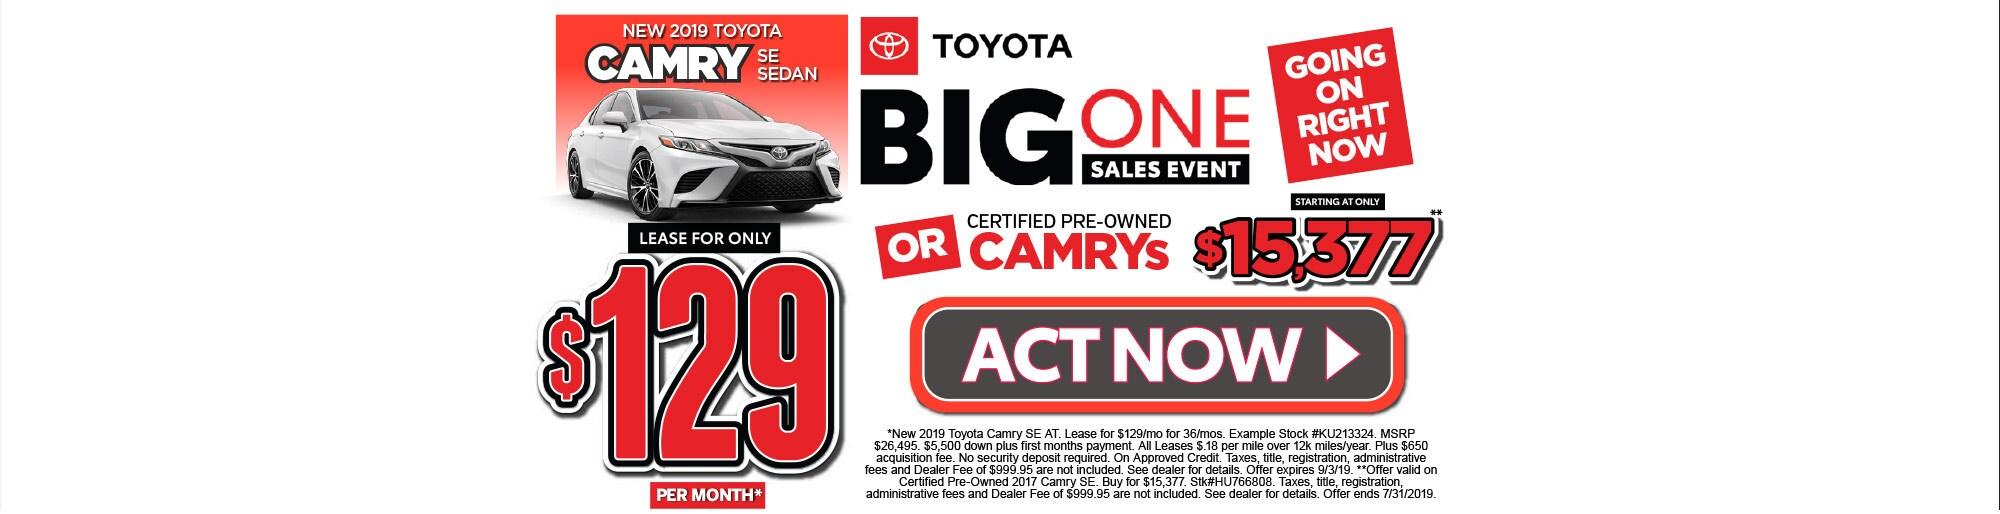 Toyota Of South Florida >> Central Florida Toyota New Toyota Dealership In Orlando Fl